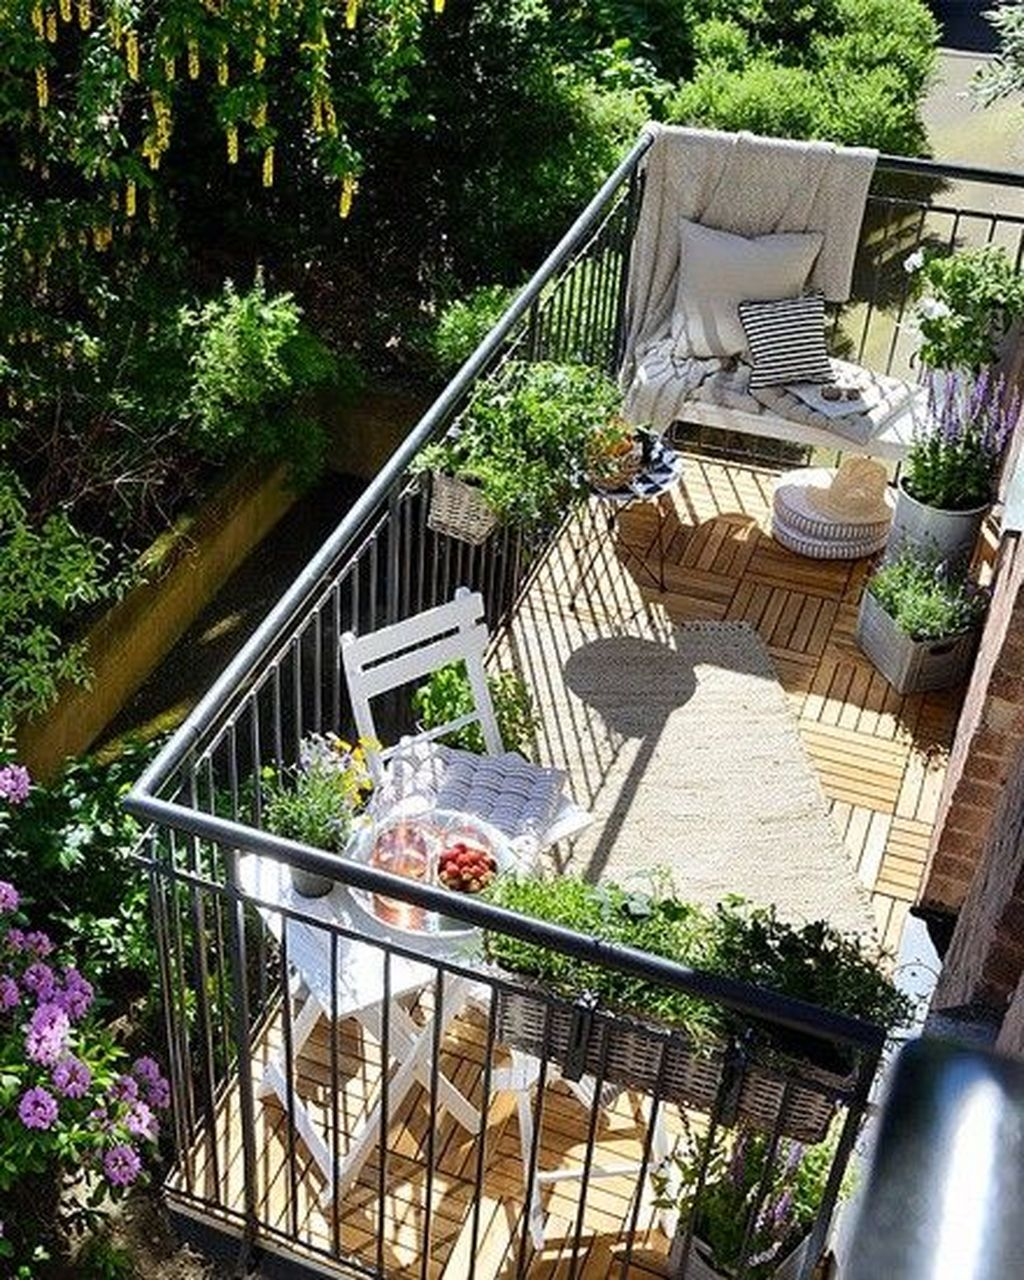 33 Apartment Balcony Garden Ideas That You Will Love: 33 Beauty Small Balcony Garden Ideas